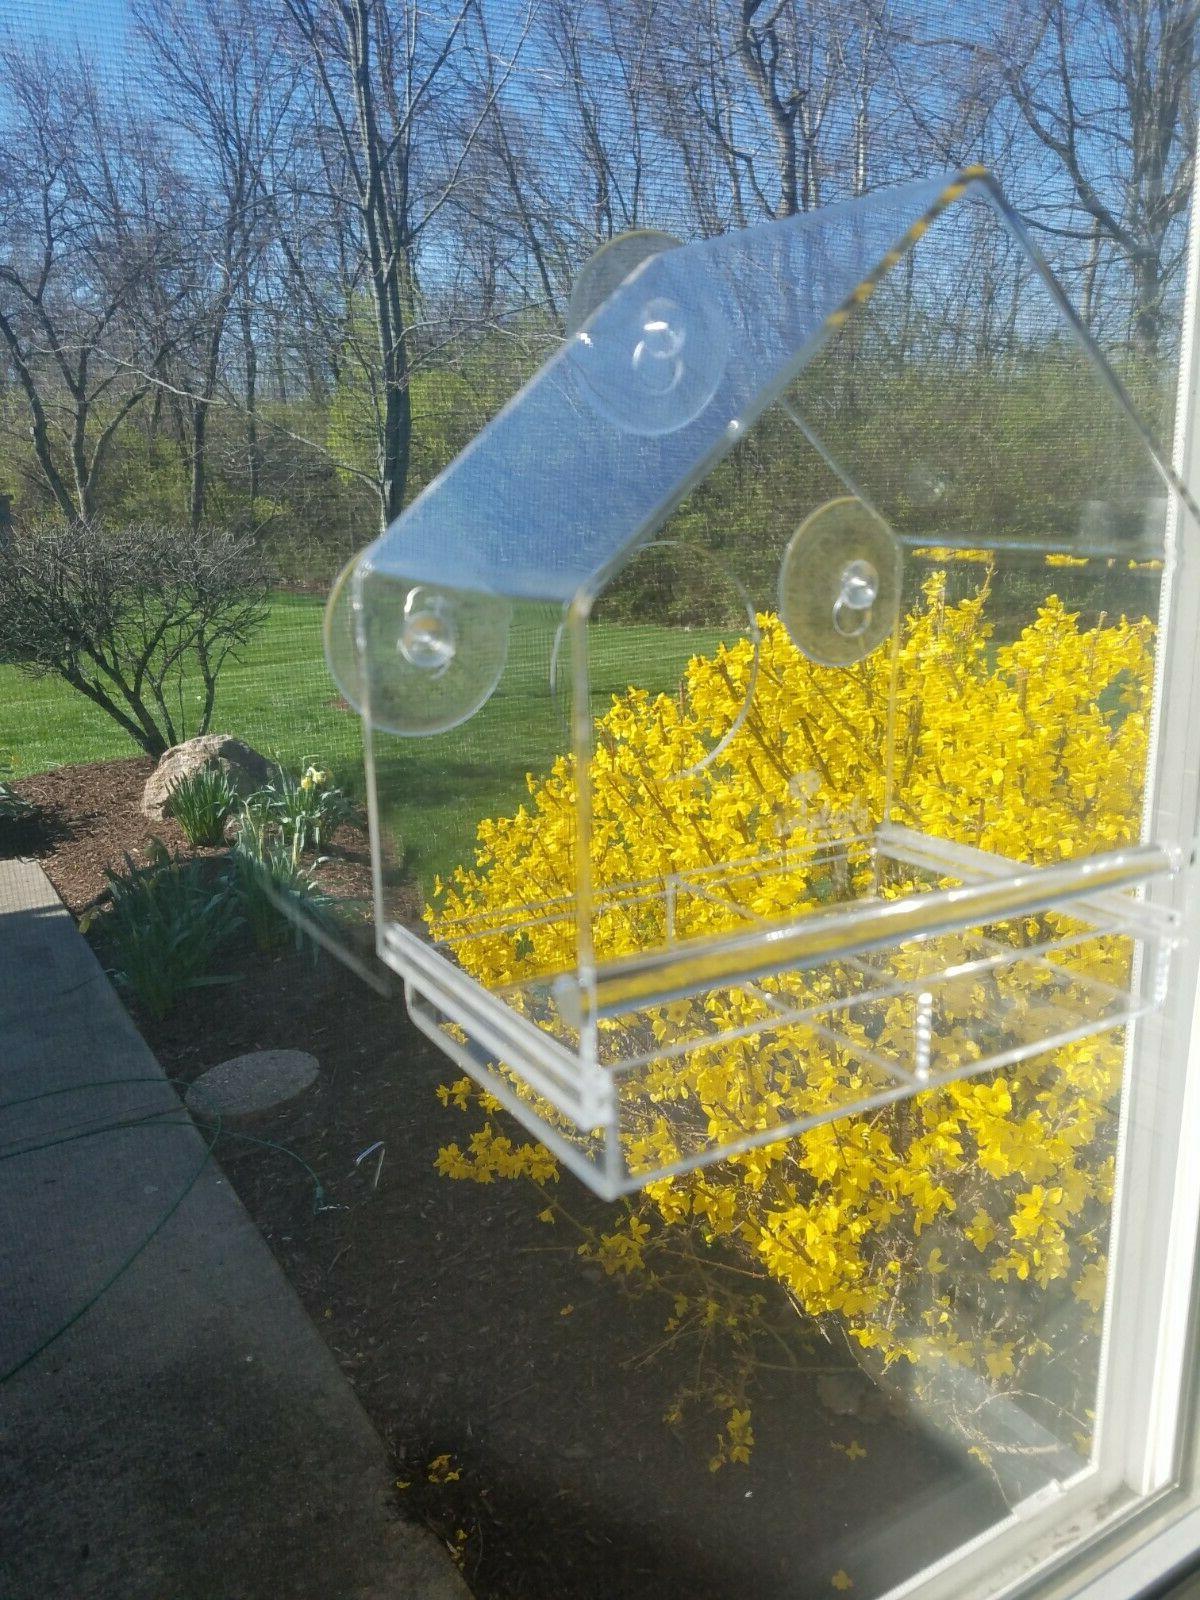 Acrylic Window with Removable Tray Window Viewing Birdfeeder